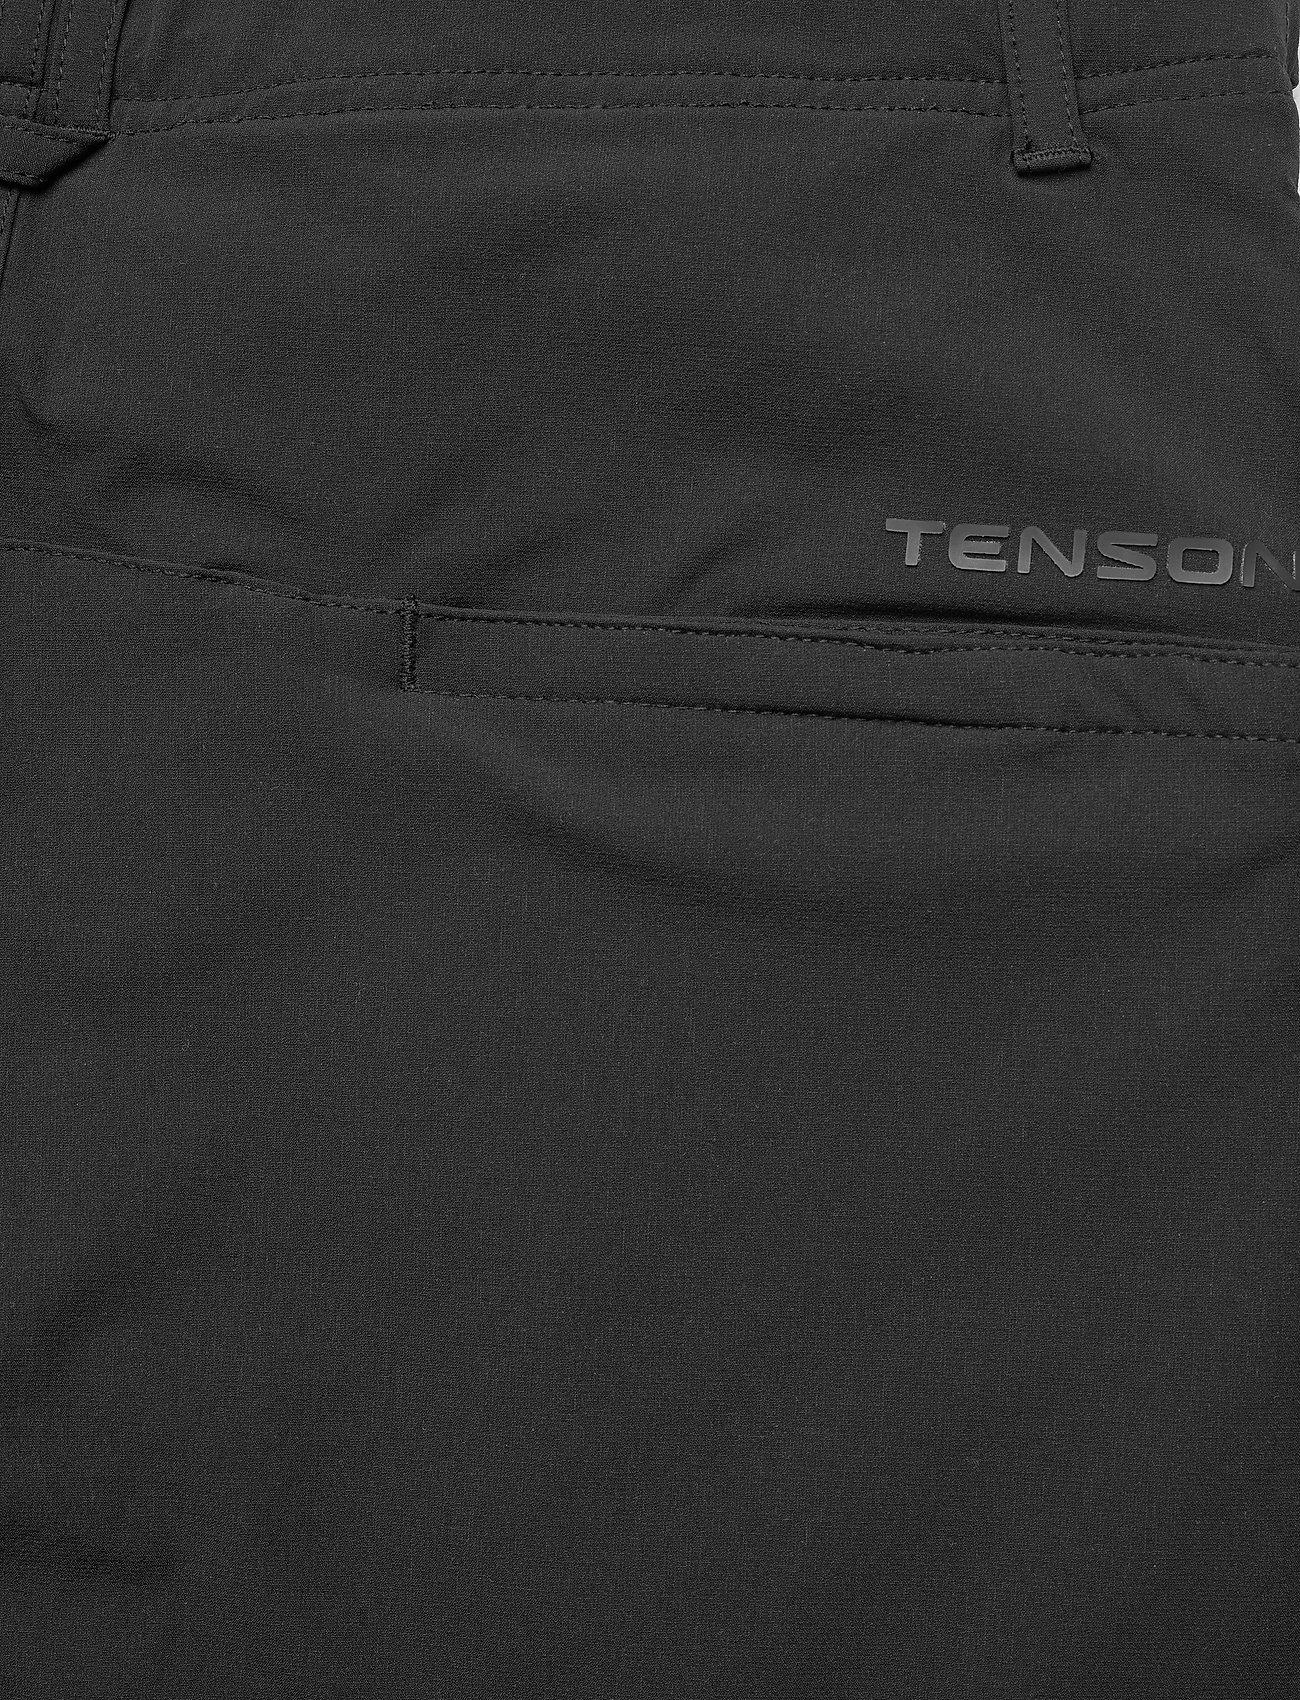 Lora (Black) (38.50 €) - Tenson Jget4